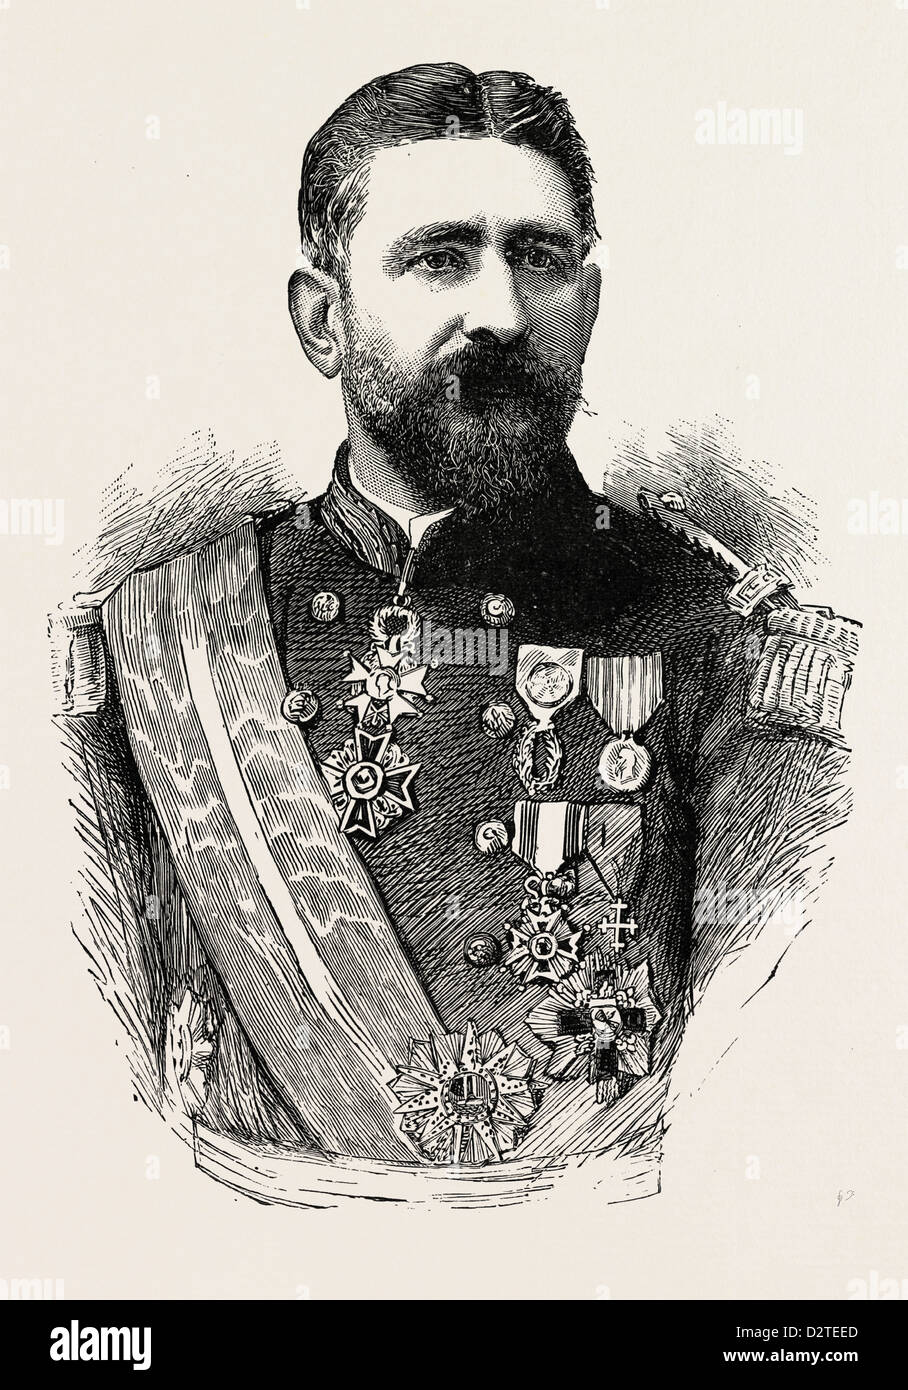 GENERAL BOULANGER, Born 1837, Died September 30, 1891 - Stock Image